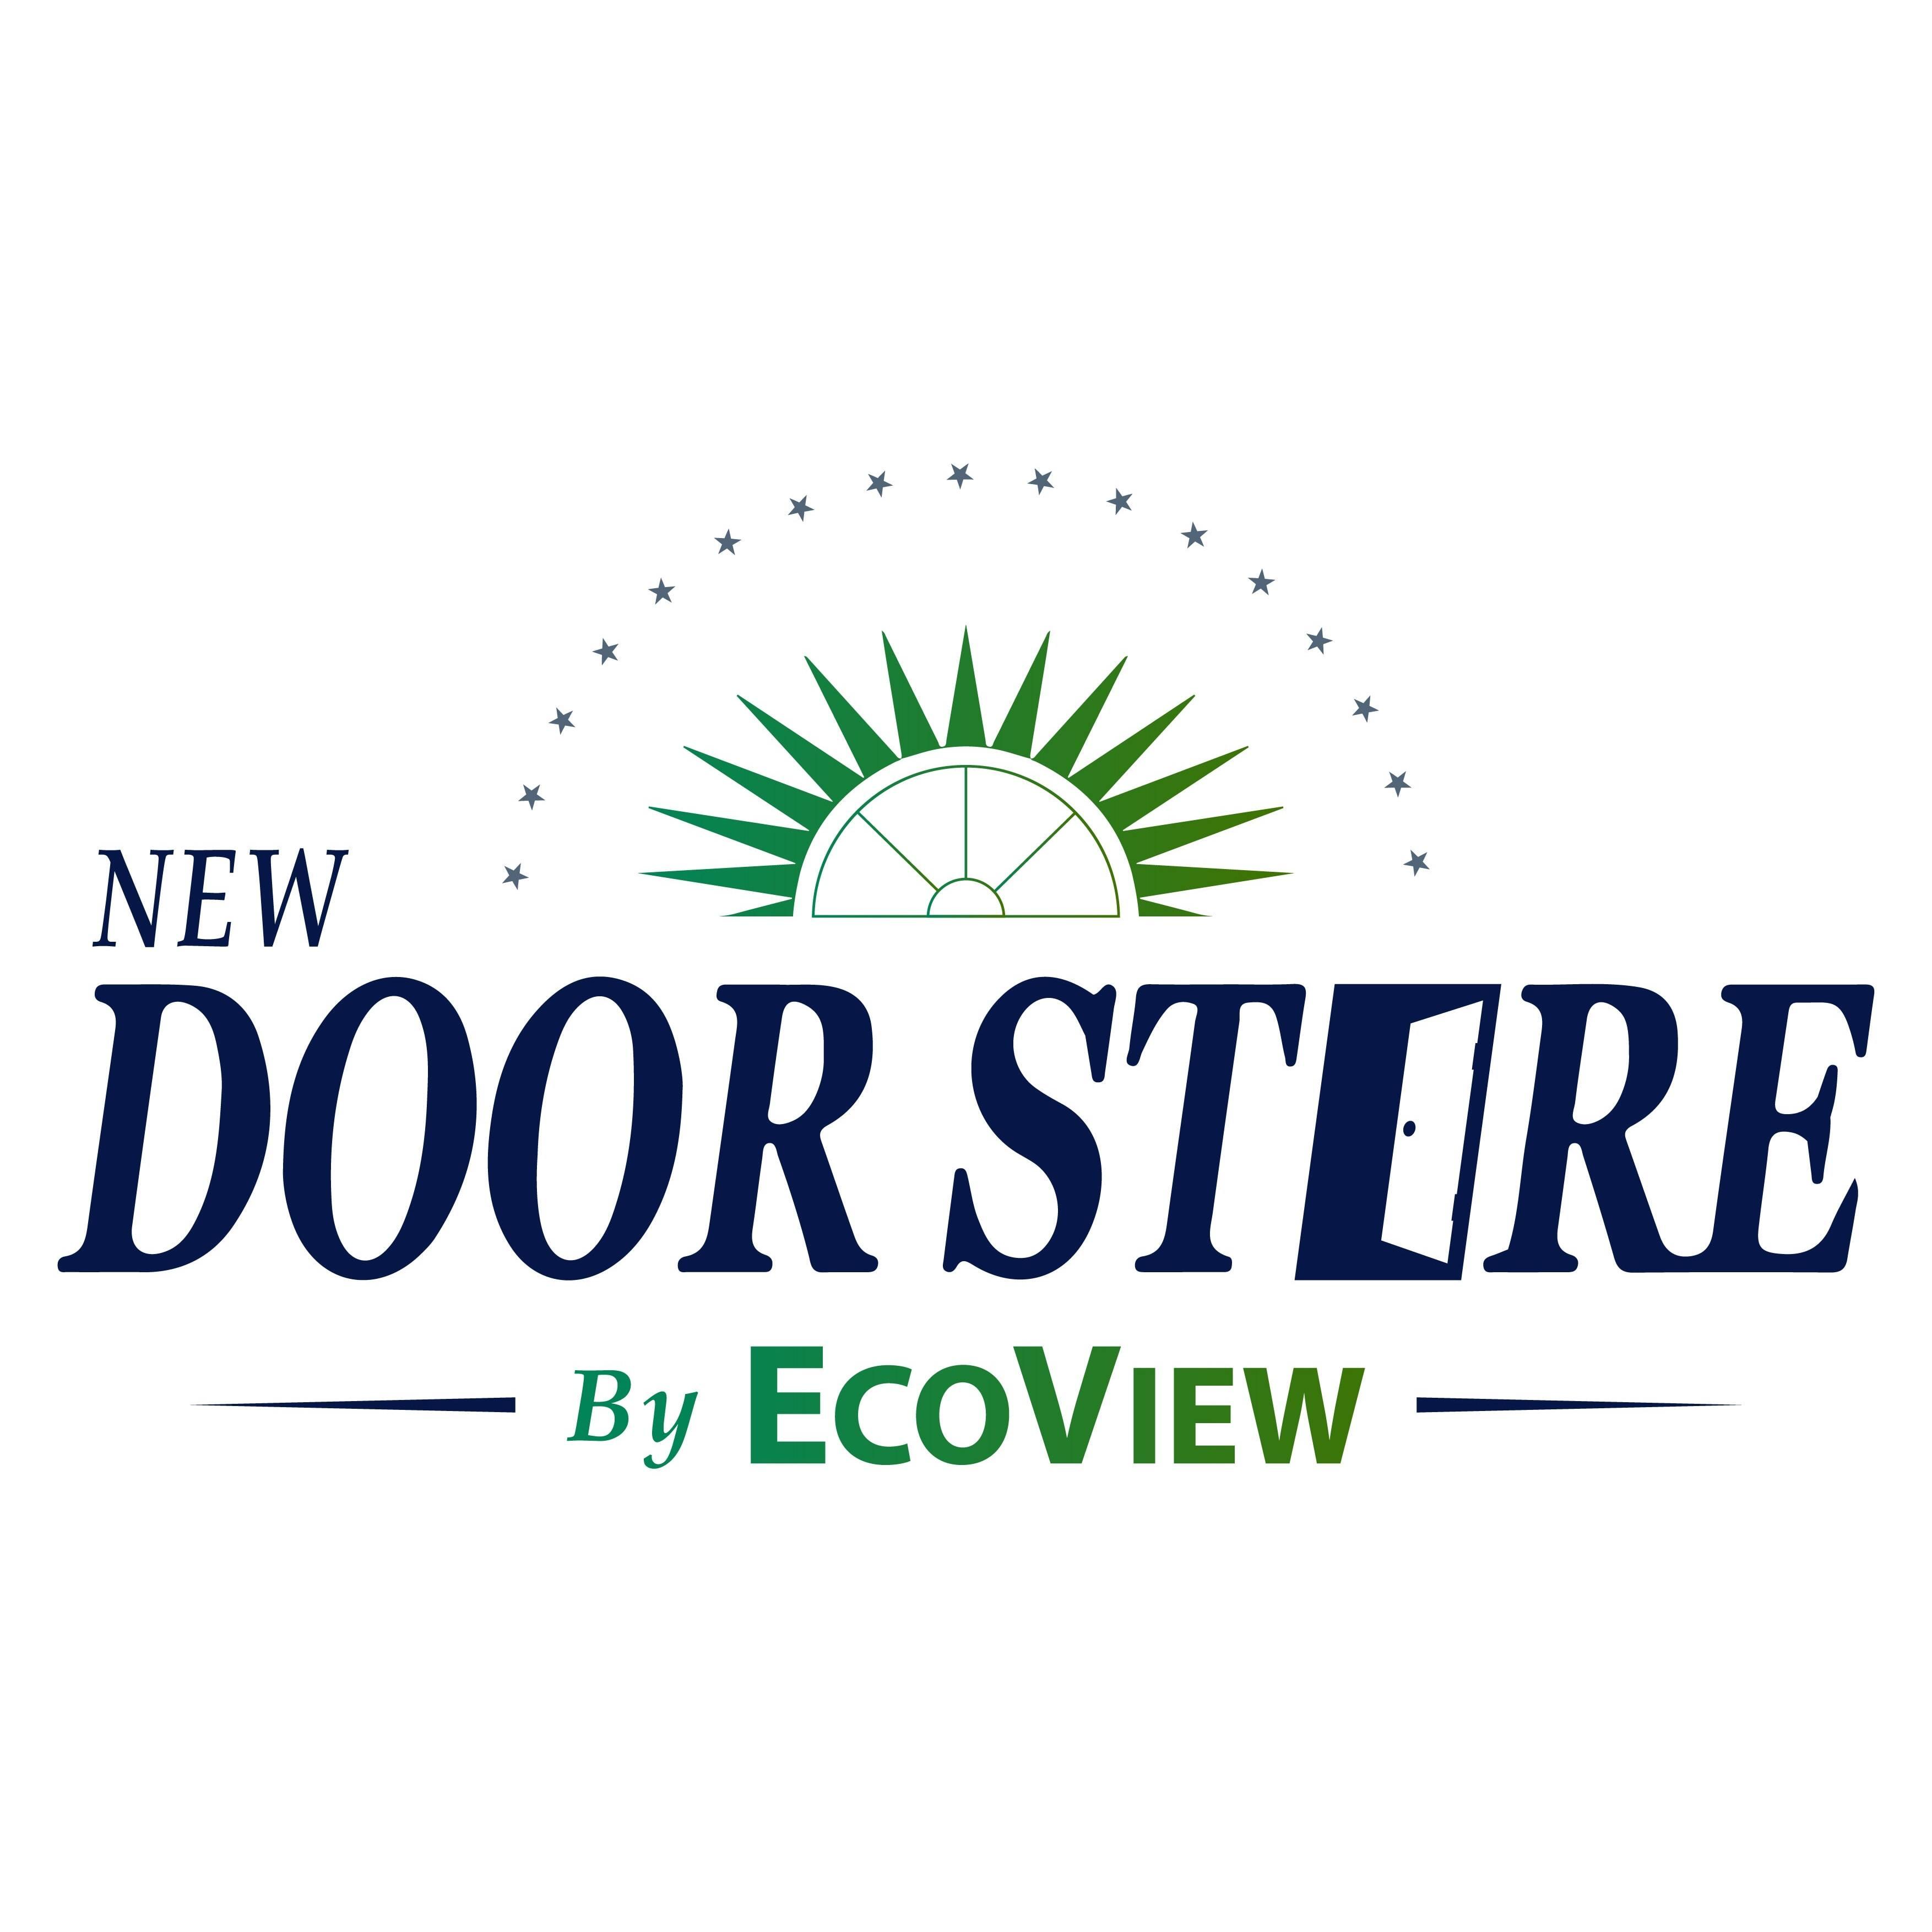 EcoView Windows & Doors image 1